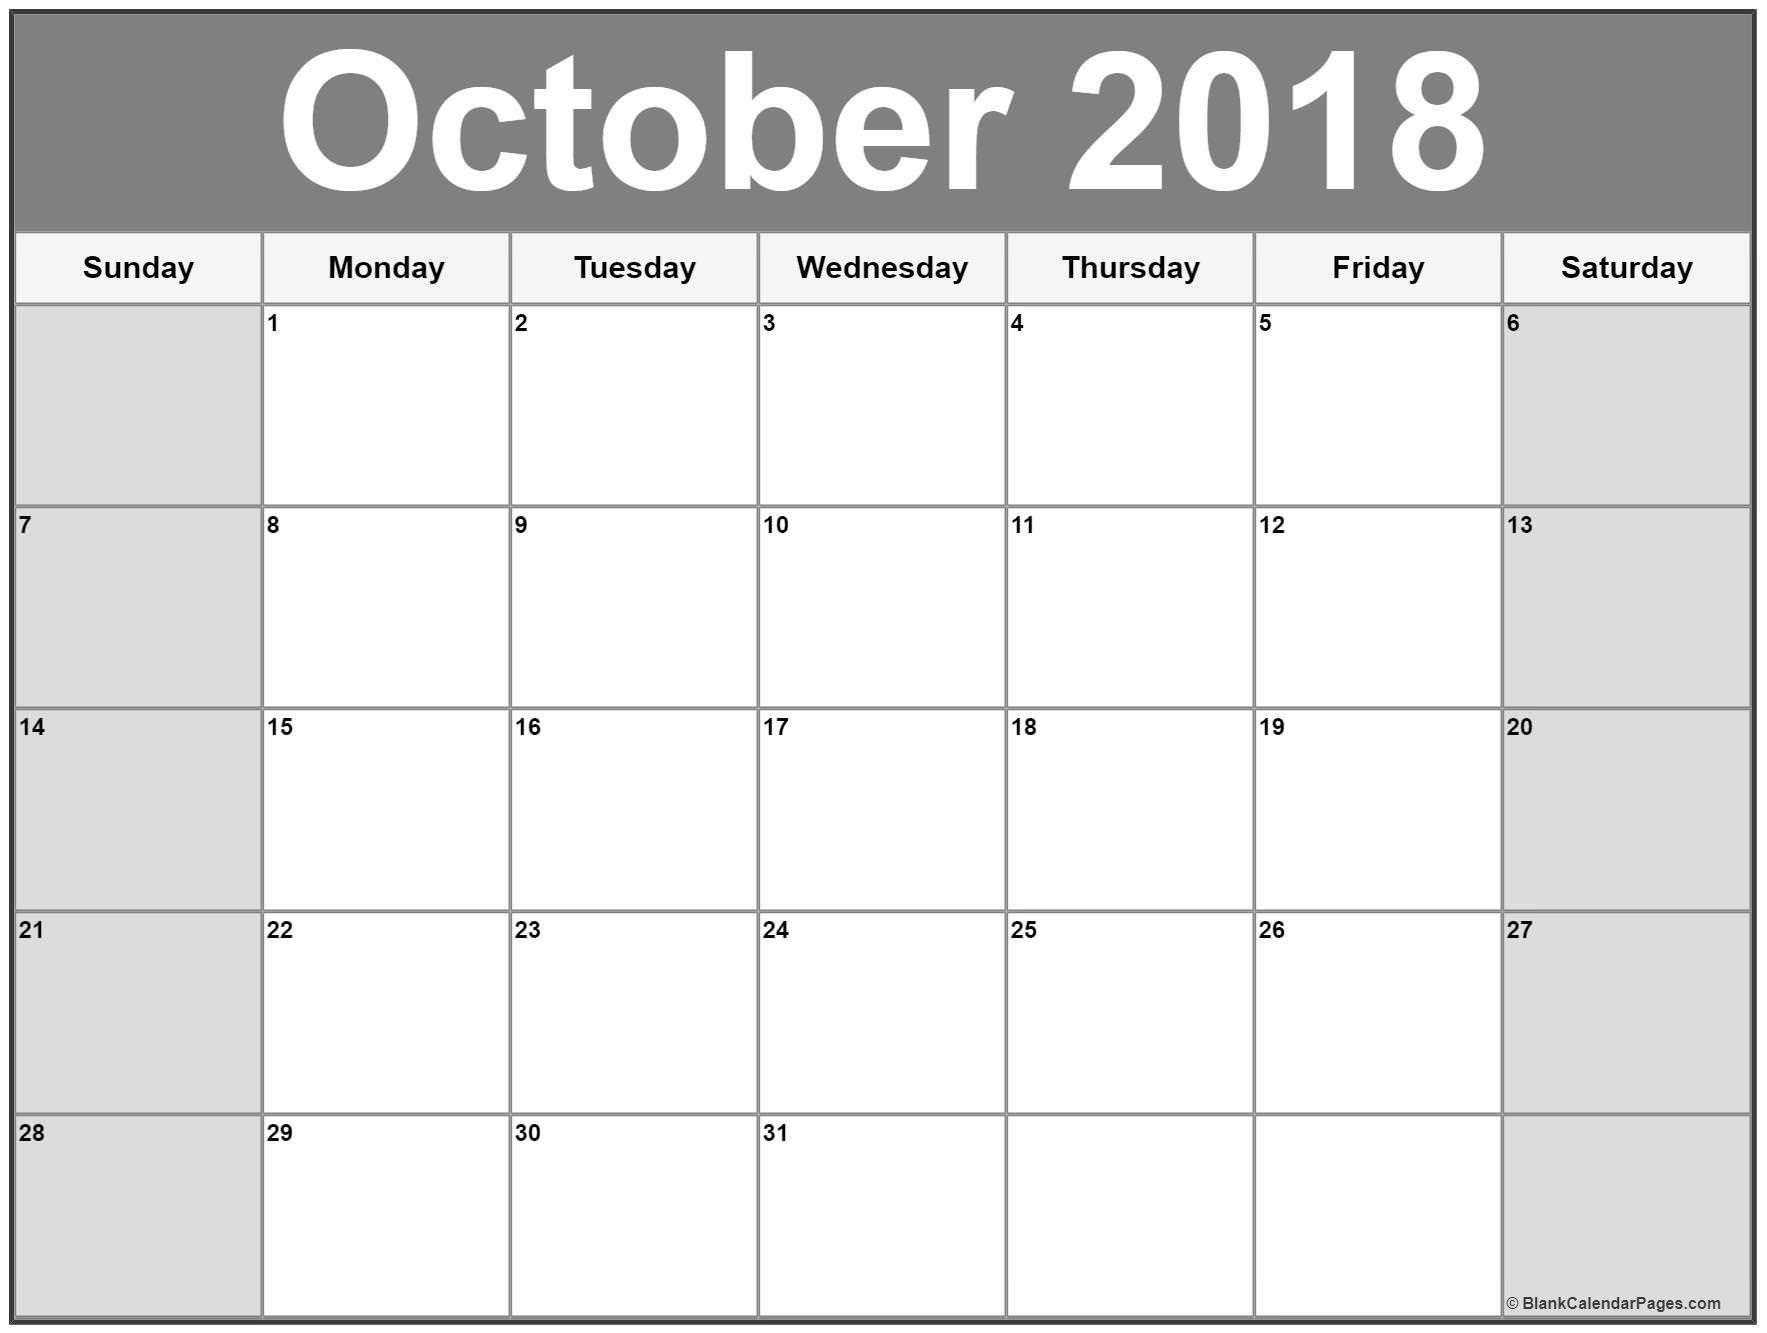 october 2018 blank calendar october printable calendar